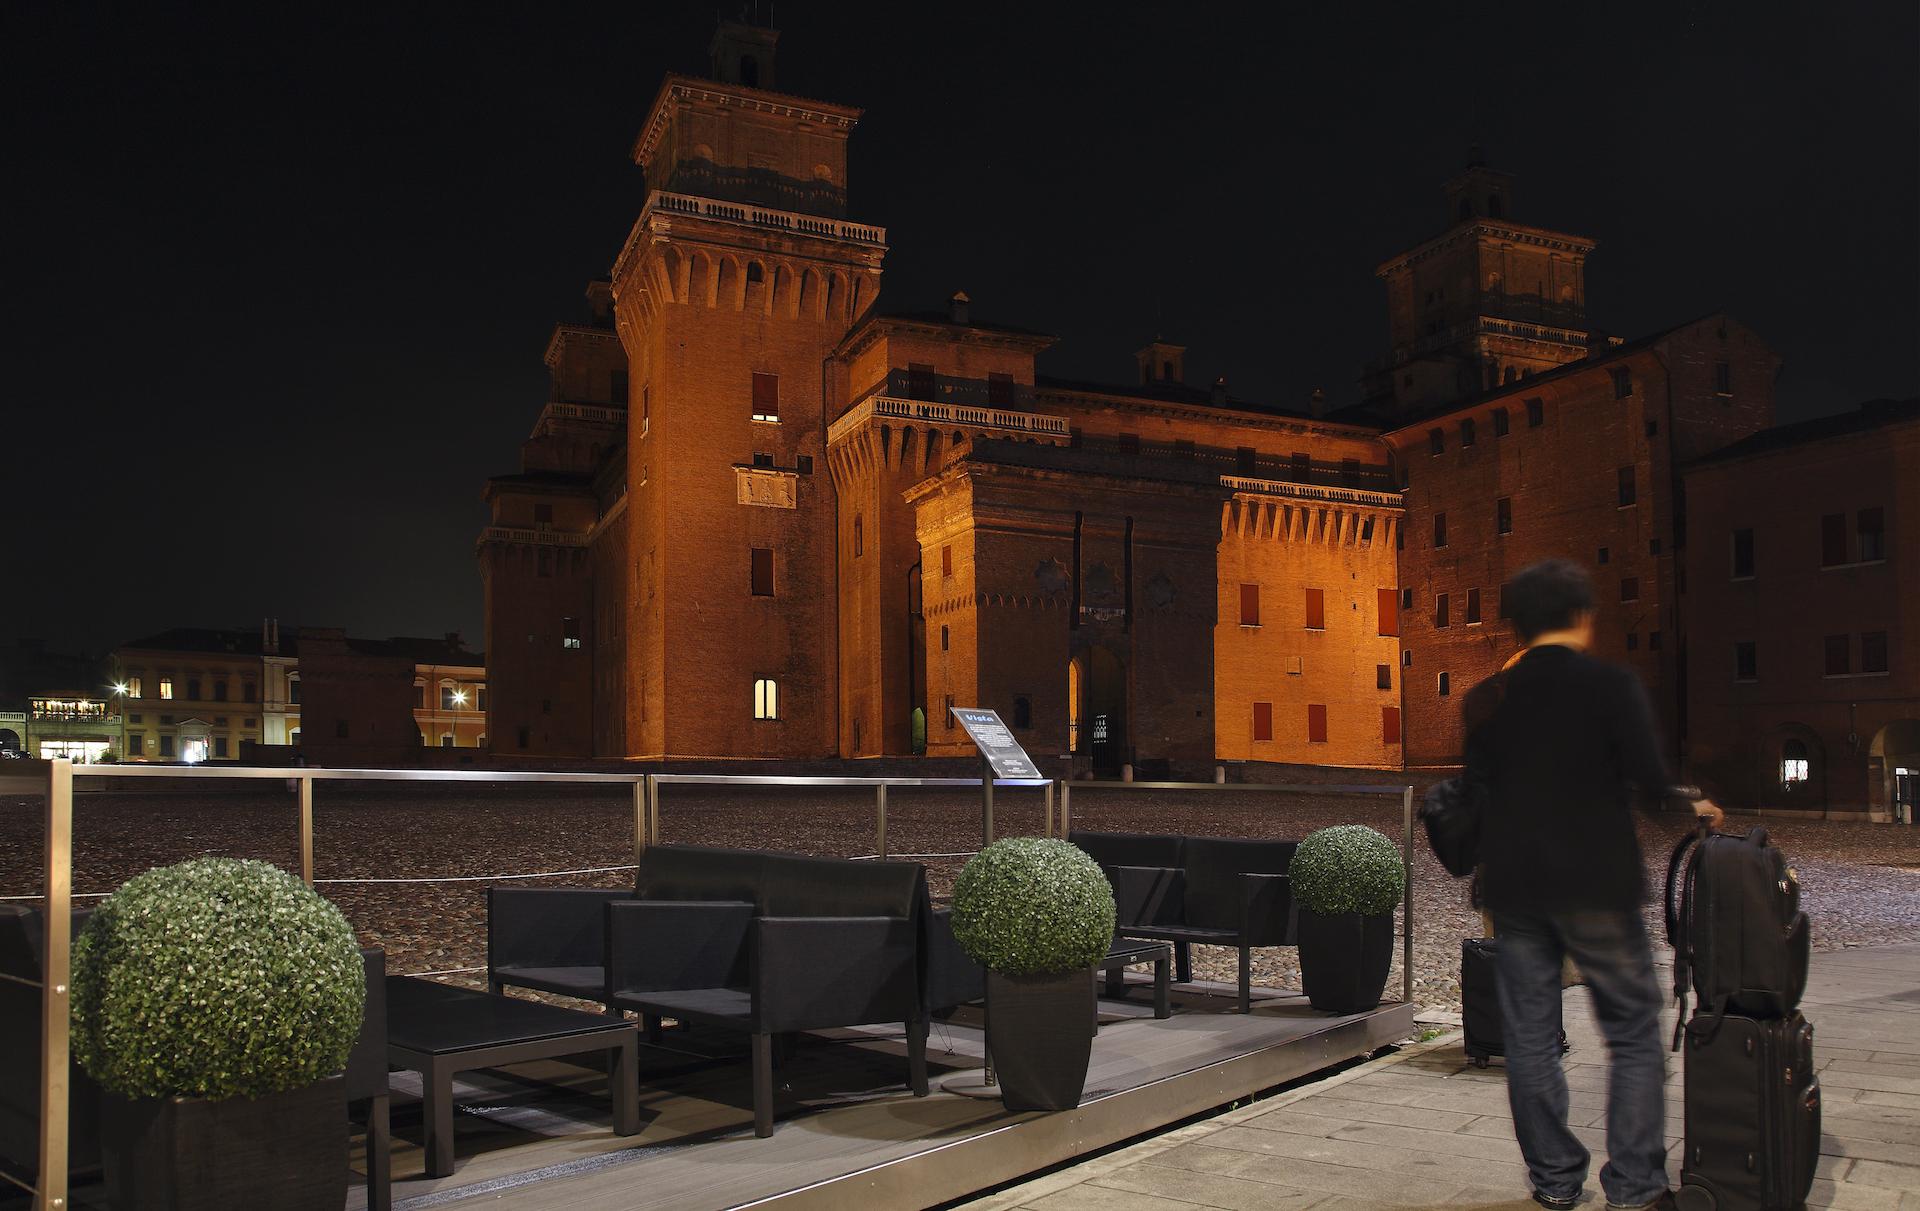 Our hotel just opposite the mediaeval Este Castle